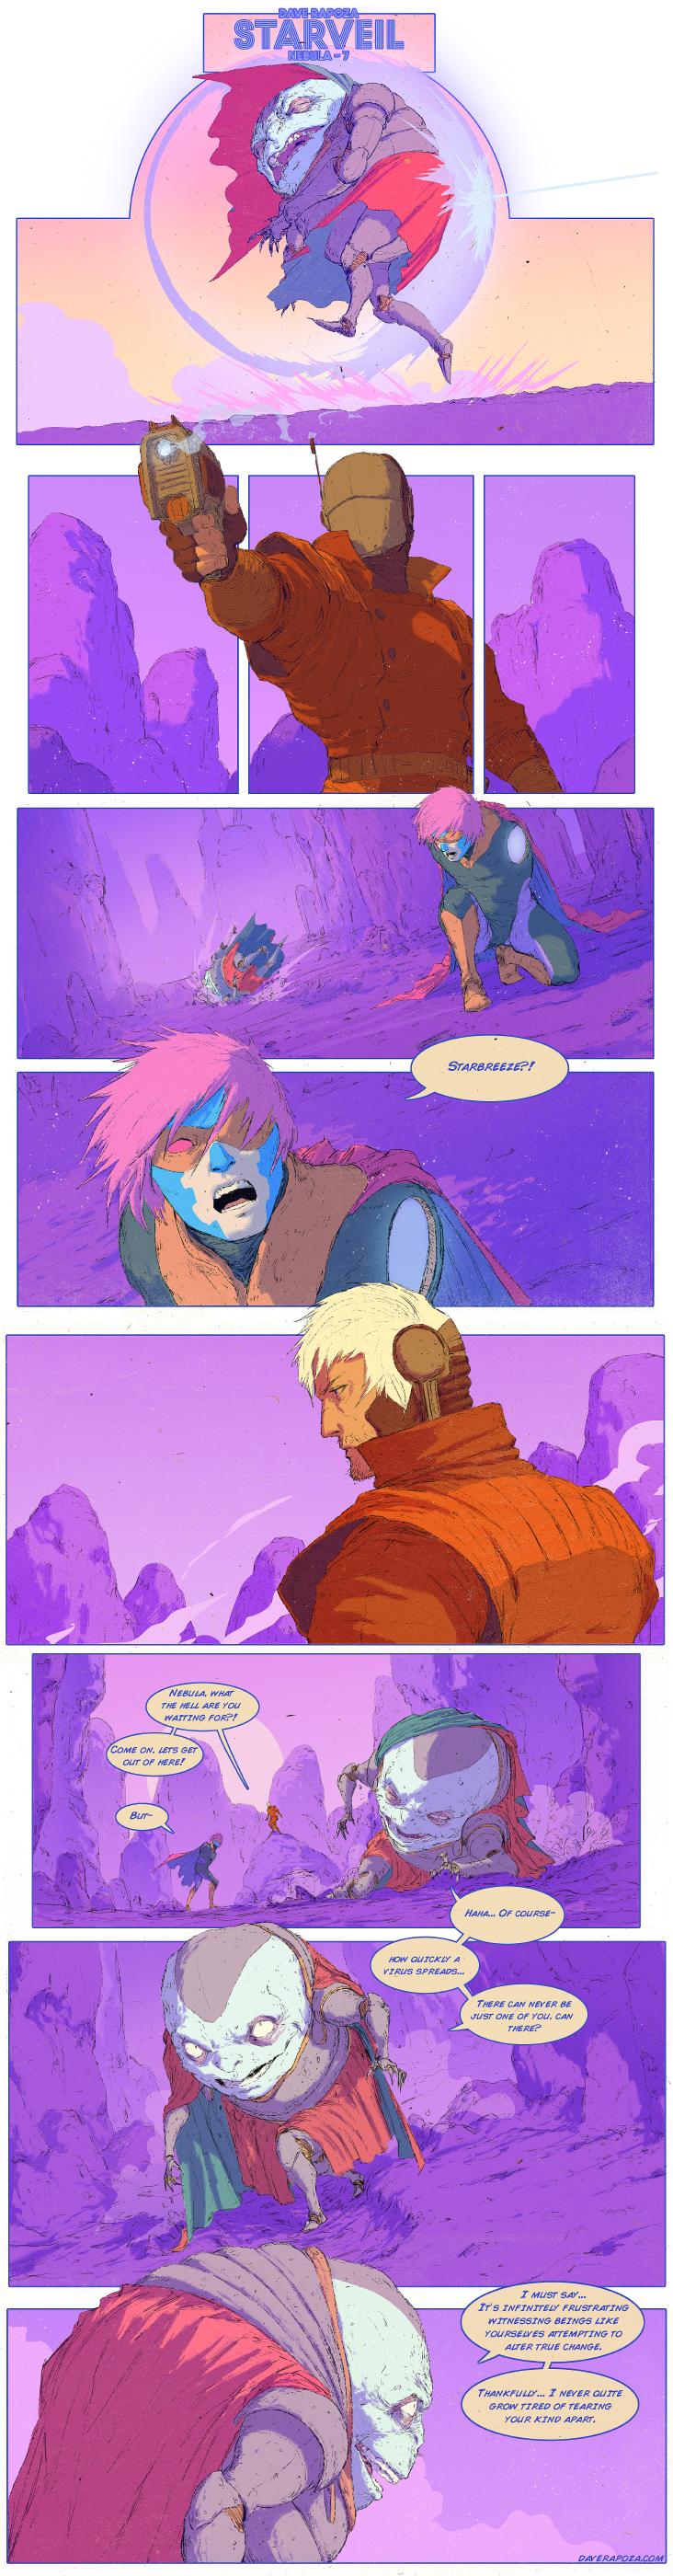 StarVeil - Nebula #7 (motion comic in description) by DavidRapozaArt